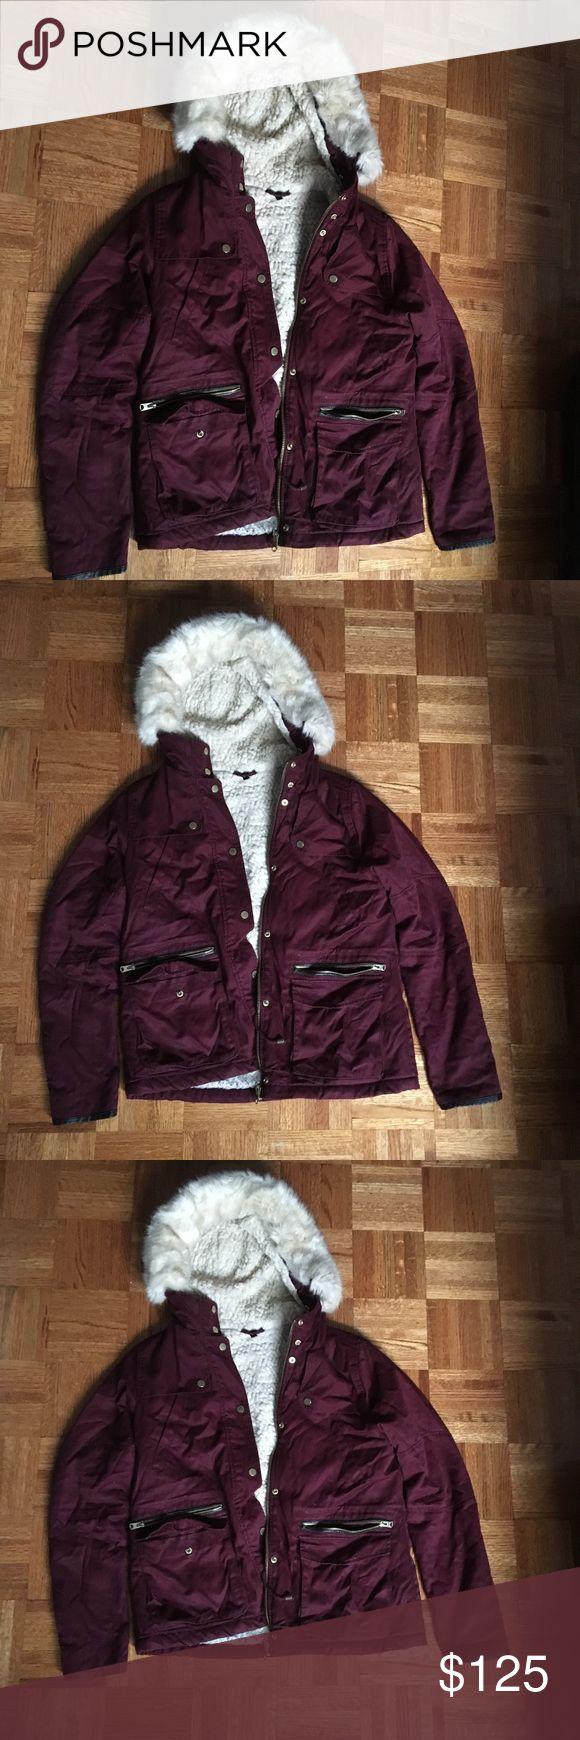 Topshop Fur Coat Its in great condition. Topshop Jackets & Coats